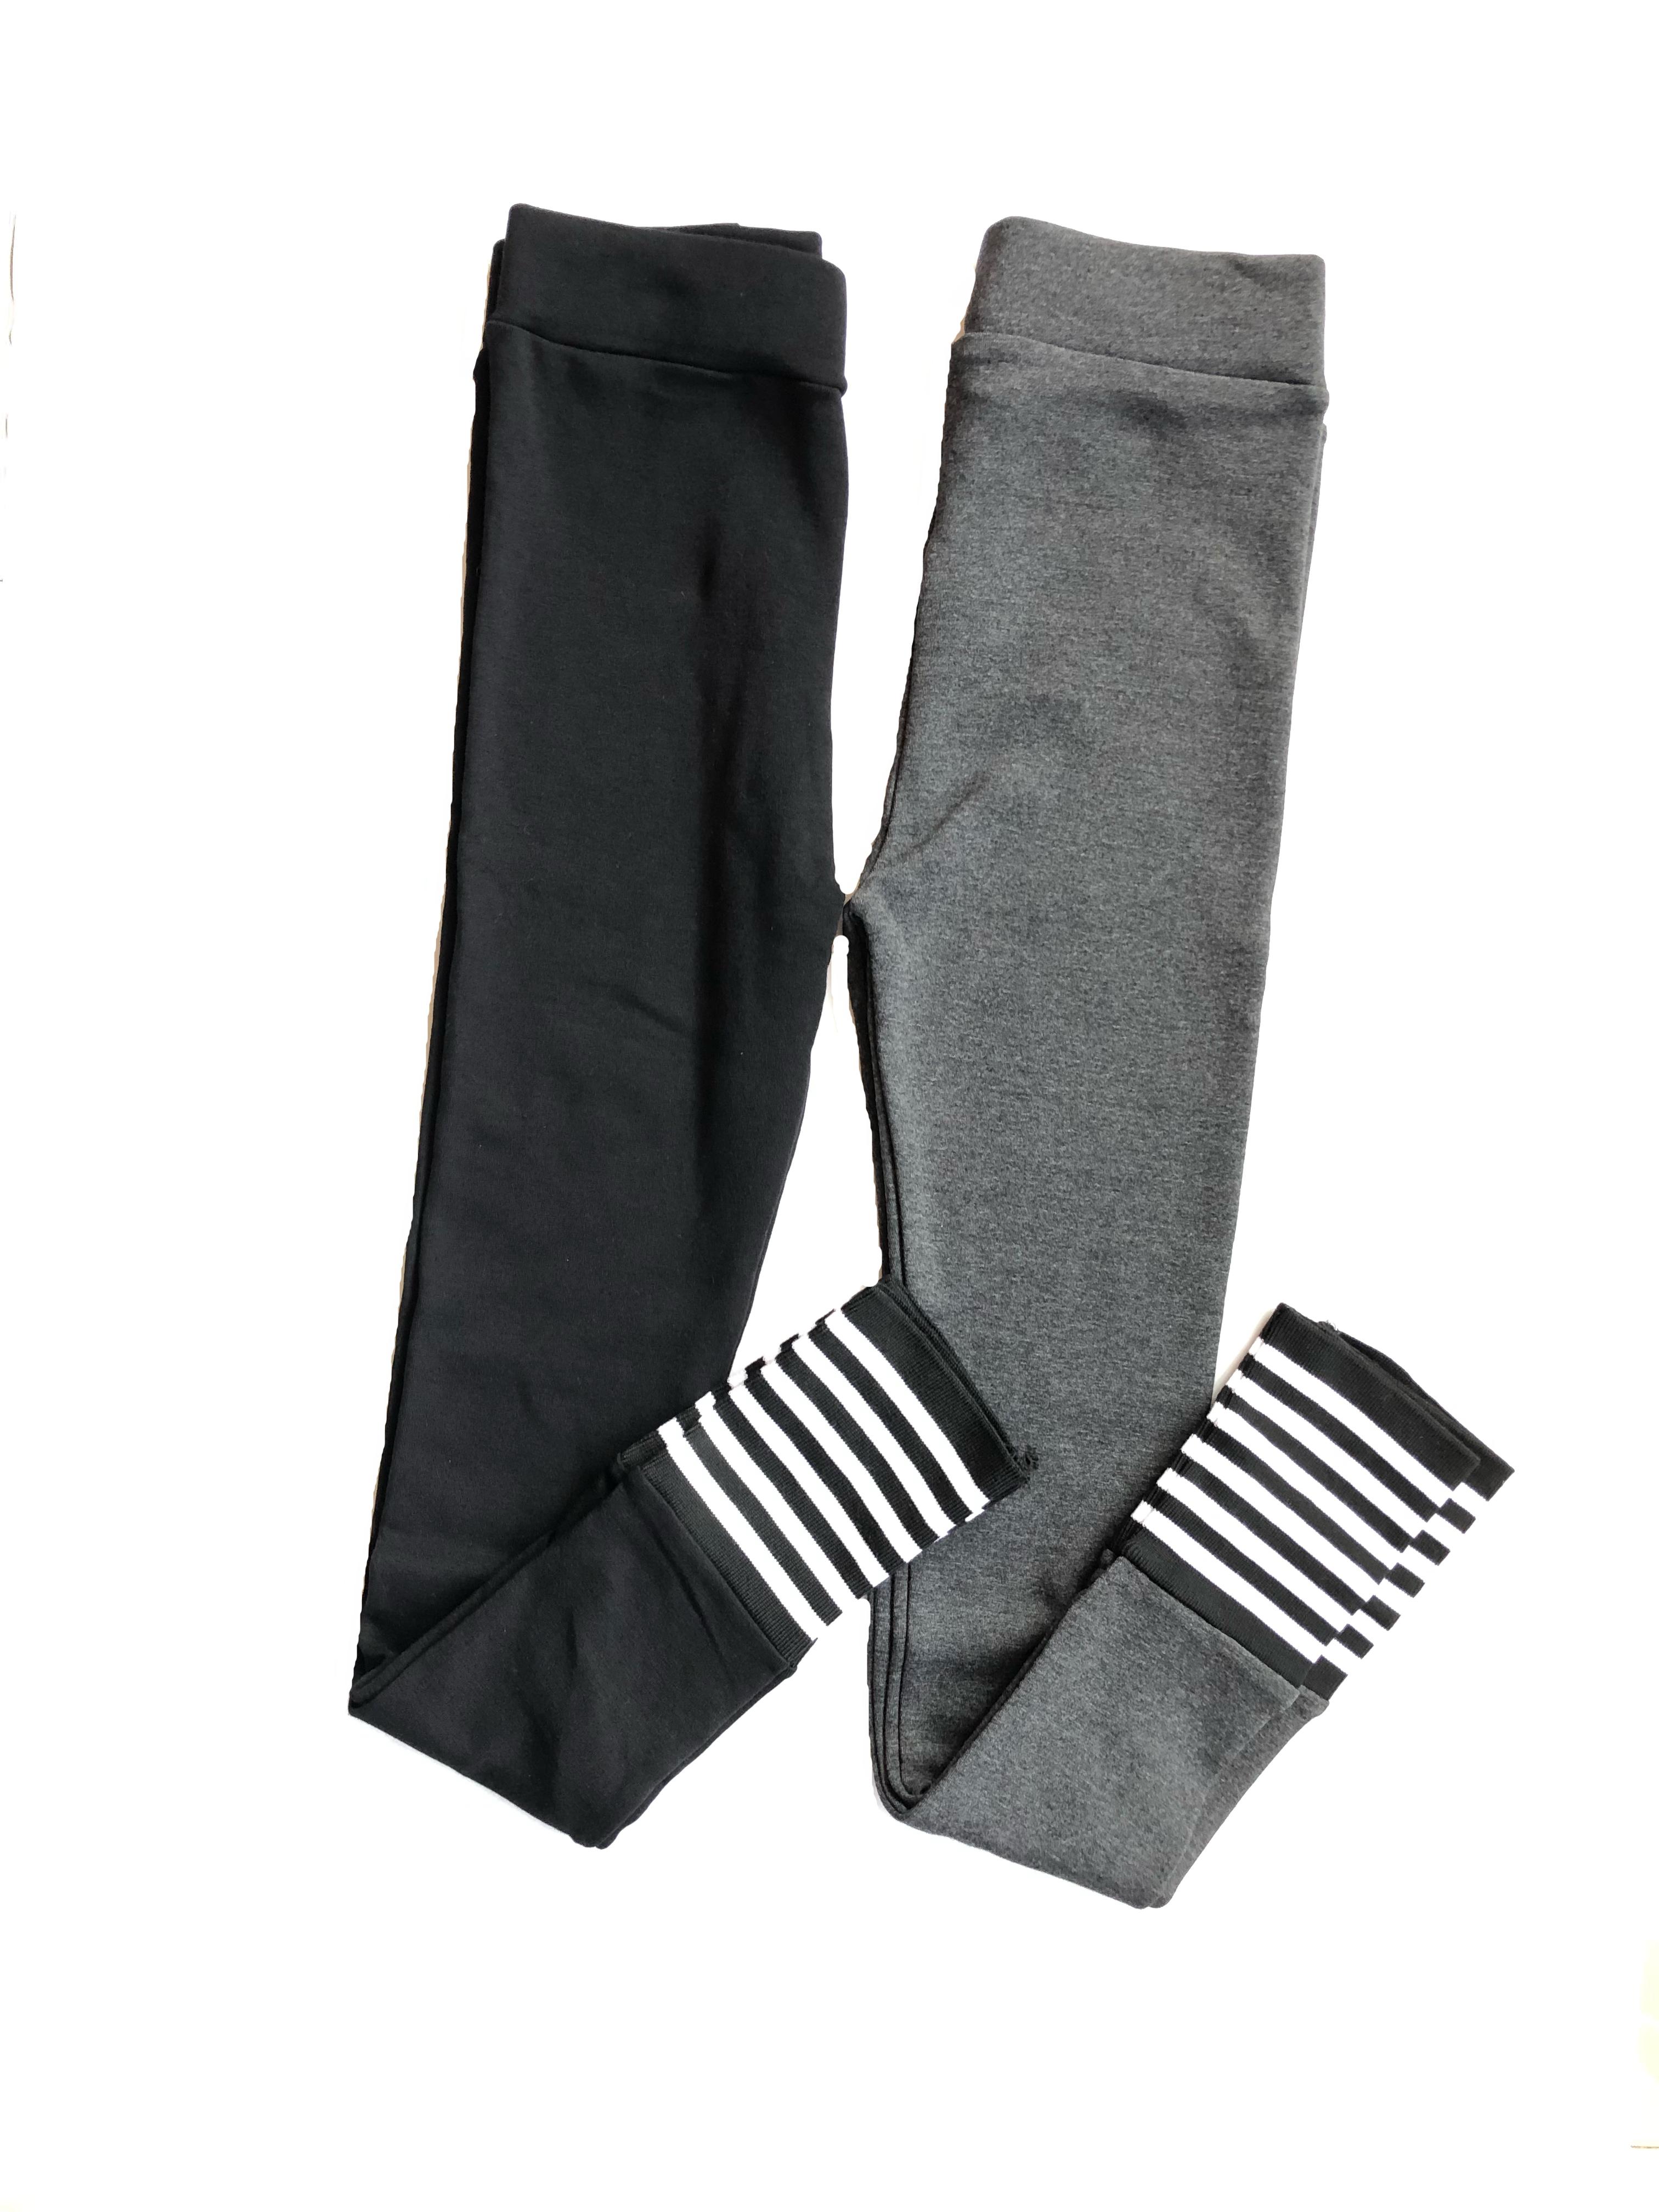 White And Black Striped leggings